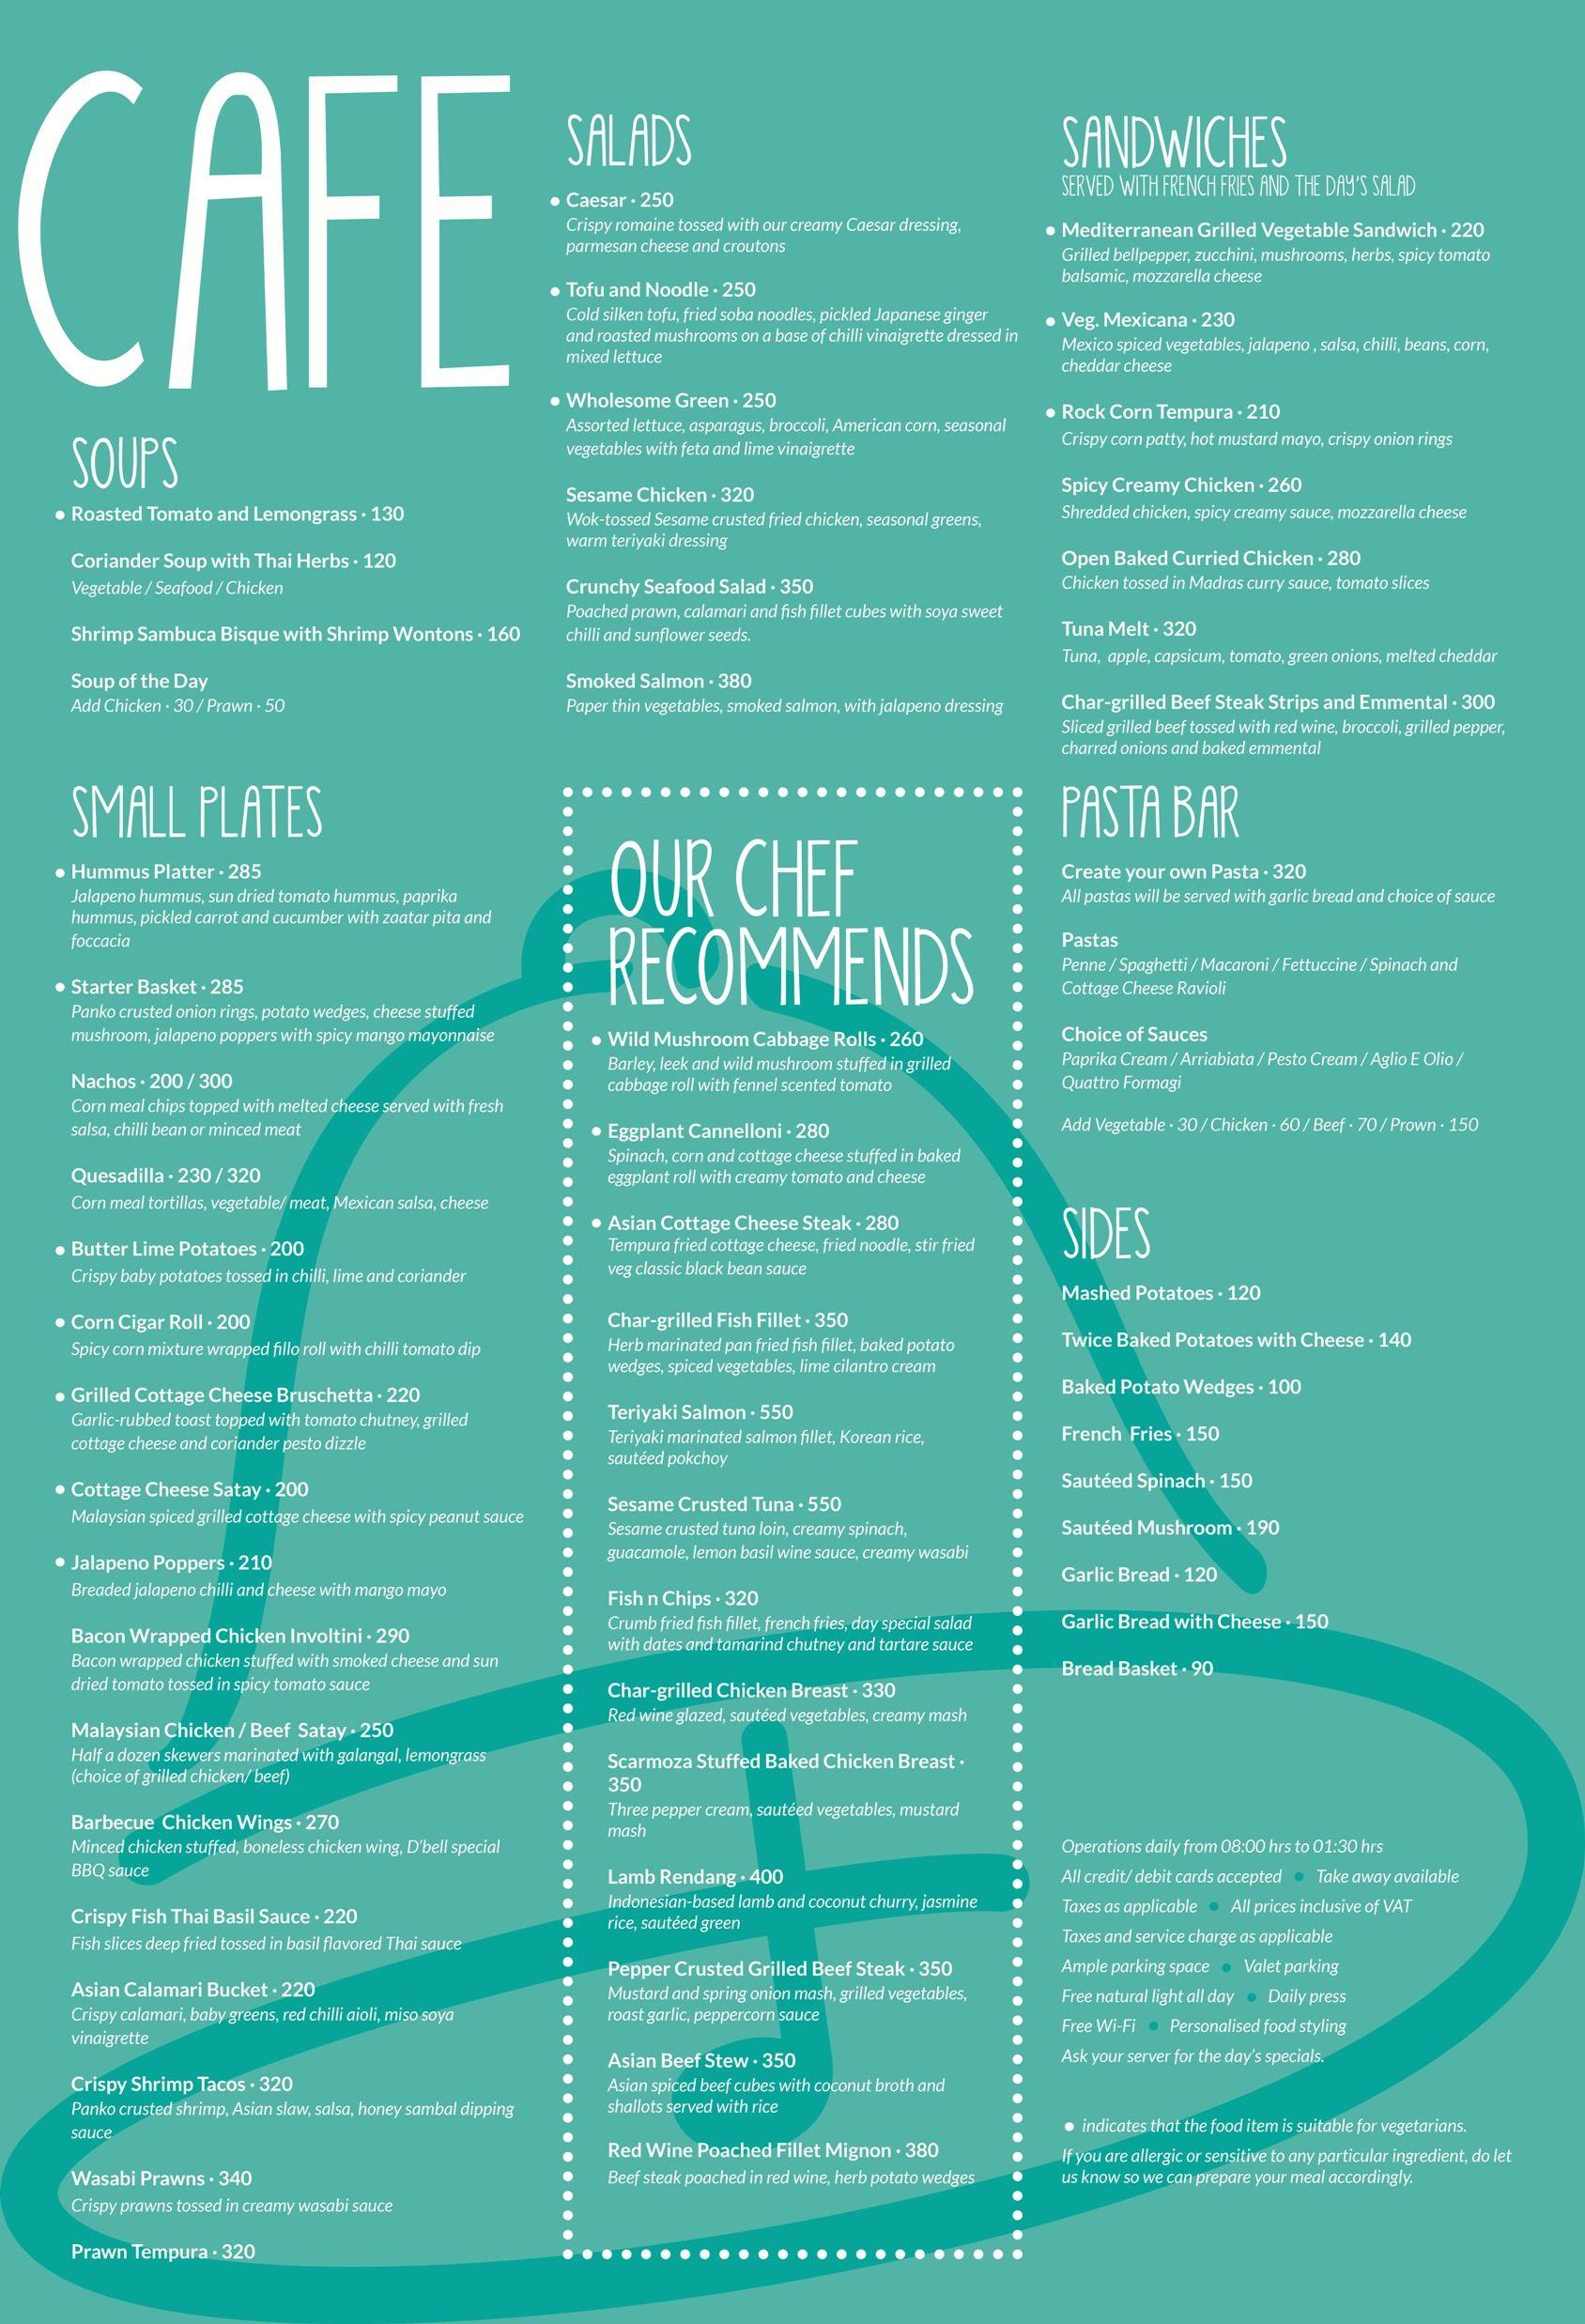 D\'Bell Cafe Menu | Cafe menu | Pinterest | Cafe menu, Menu and Cafes